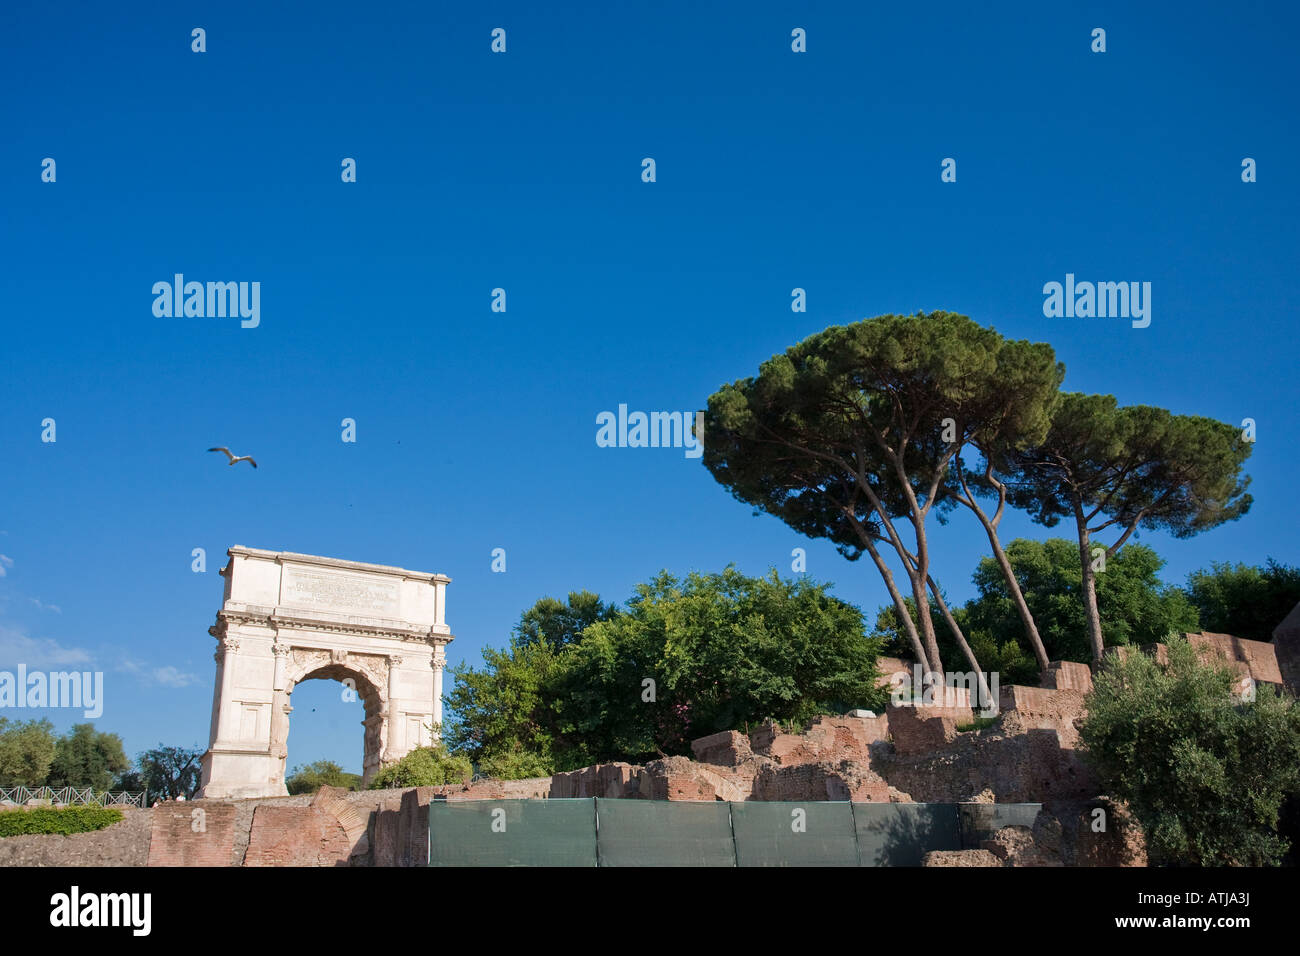 Arch of Titus Roman Forum Rome Italy - Stock Image